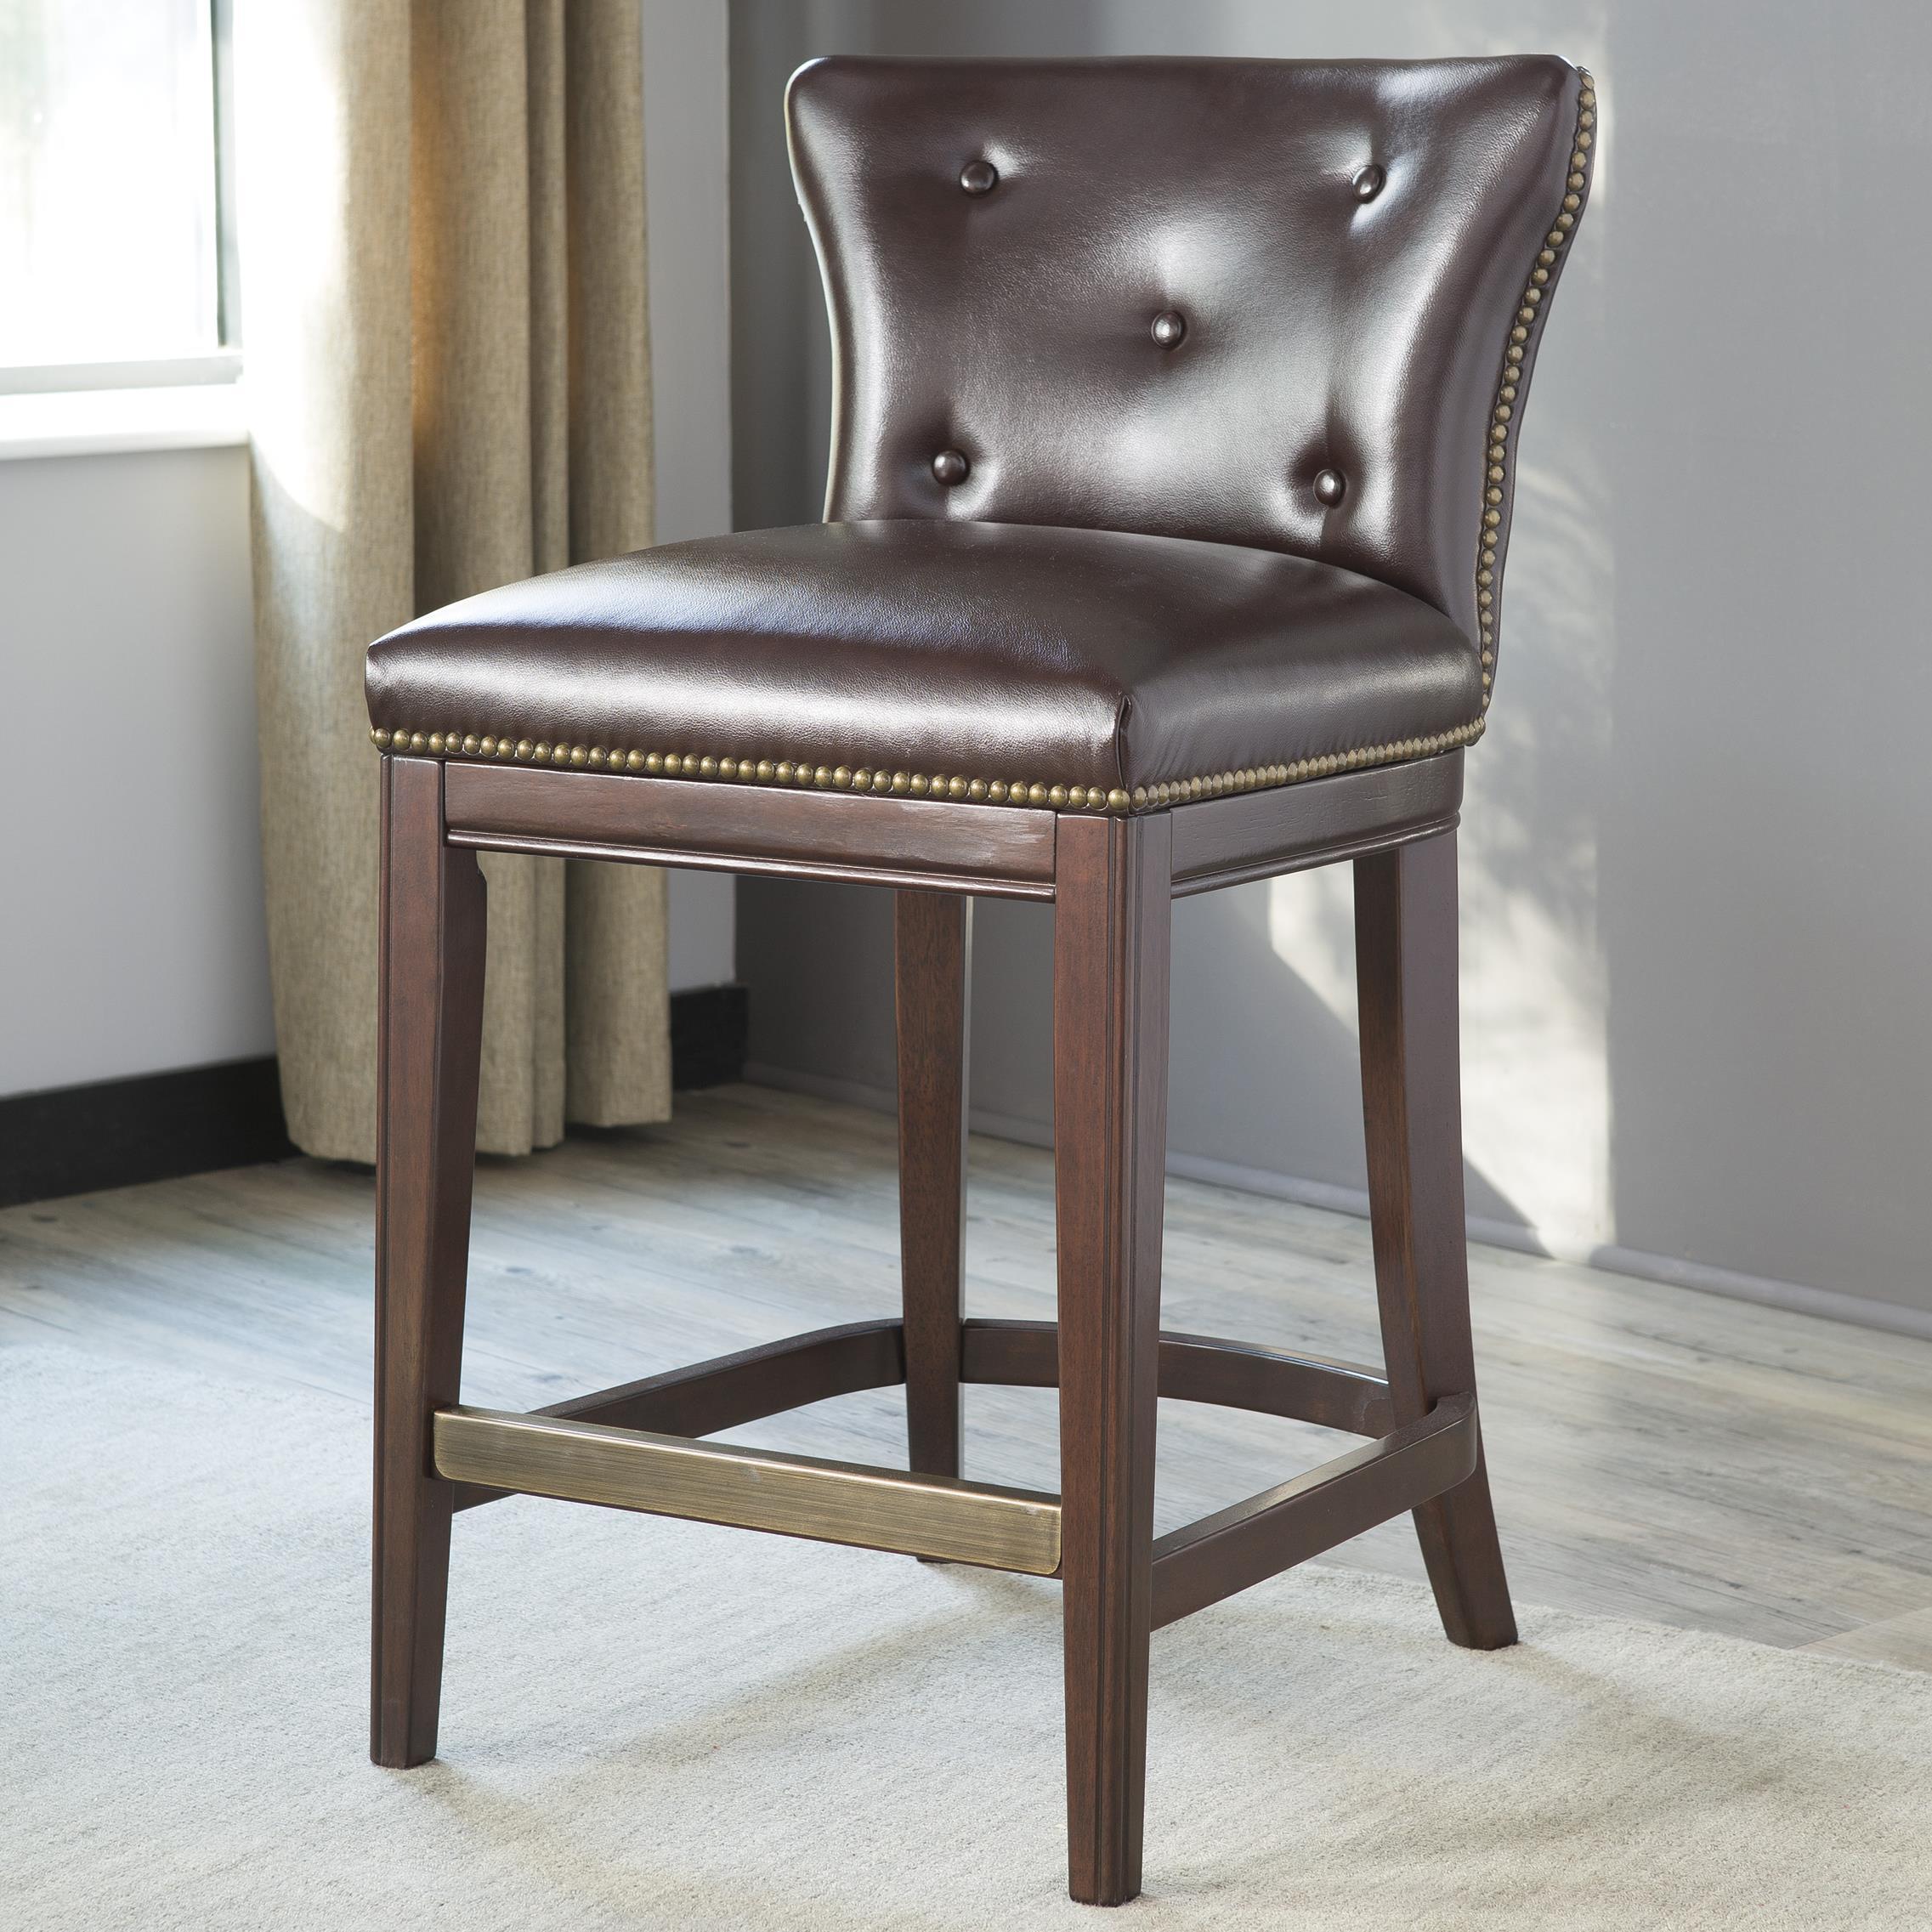 Signature Design by Ashley Canidelli Upholstered Barstool - Item Number: D500-324